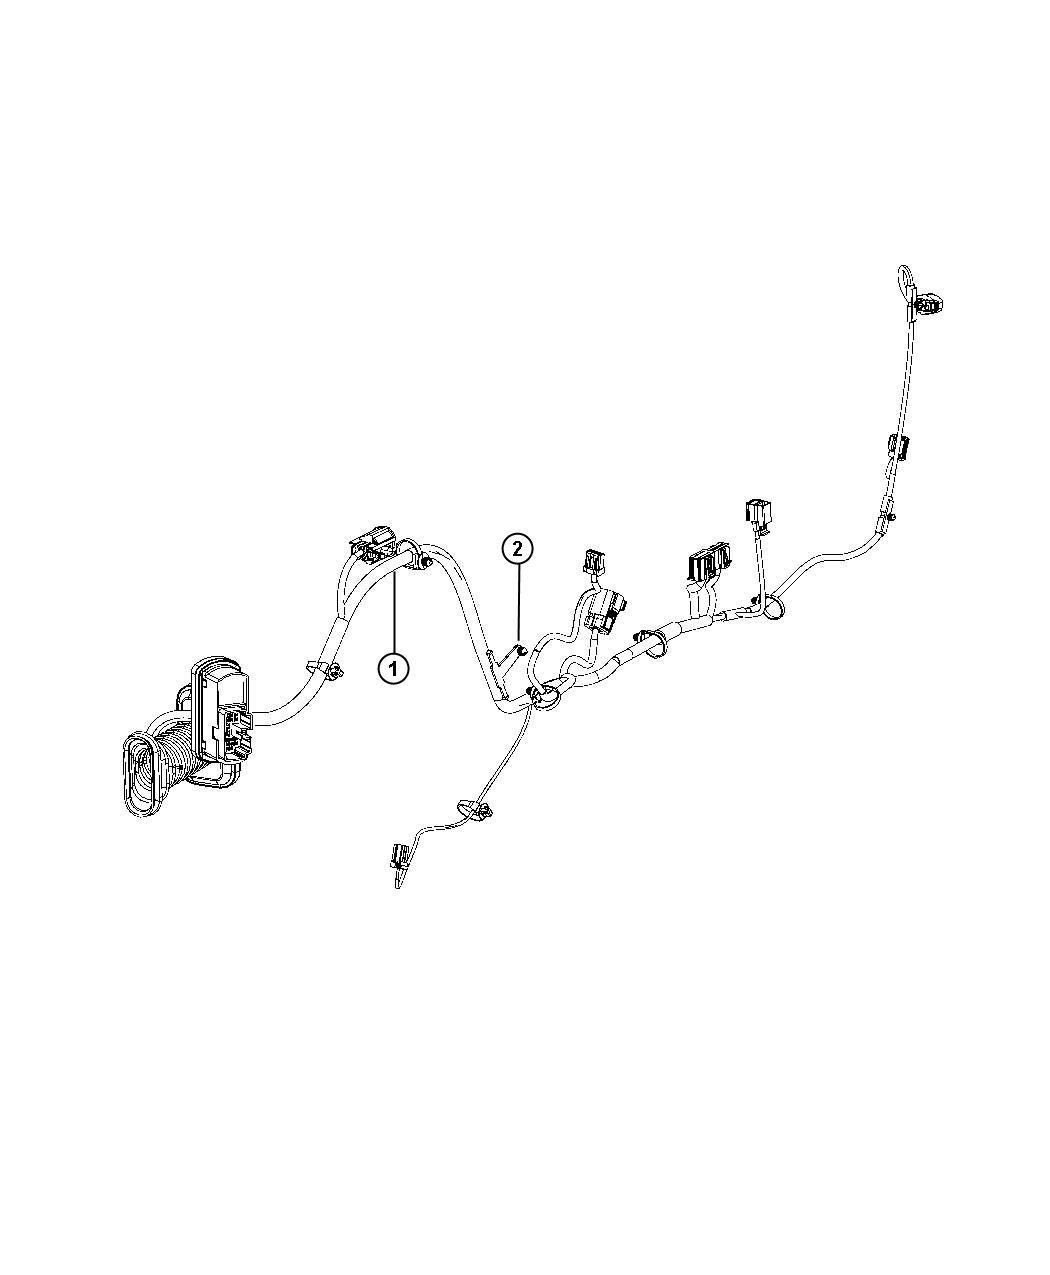 Diagram Wiring Diagram For 1973 Fiat 128 Full Version Hd Quality Fiat 128 Oraclediagrams Digitalight It